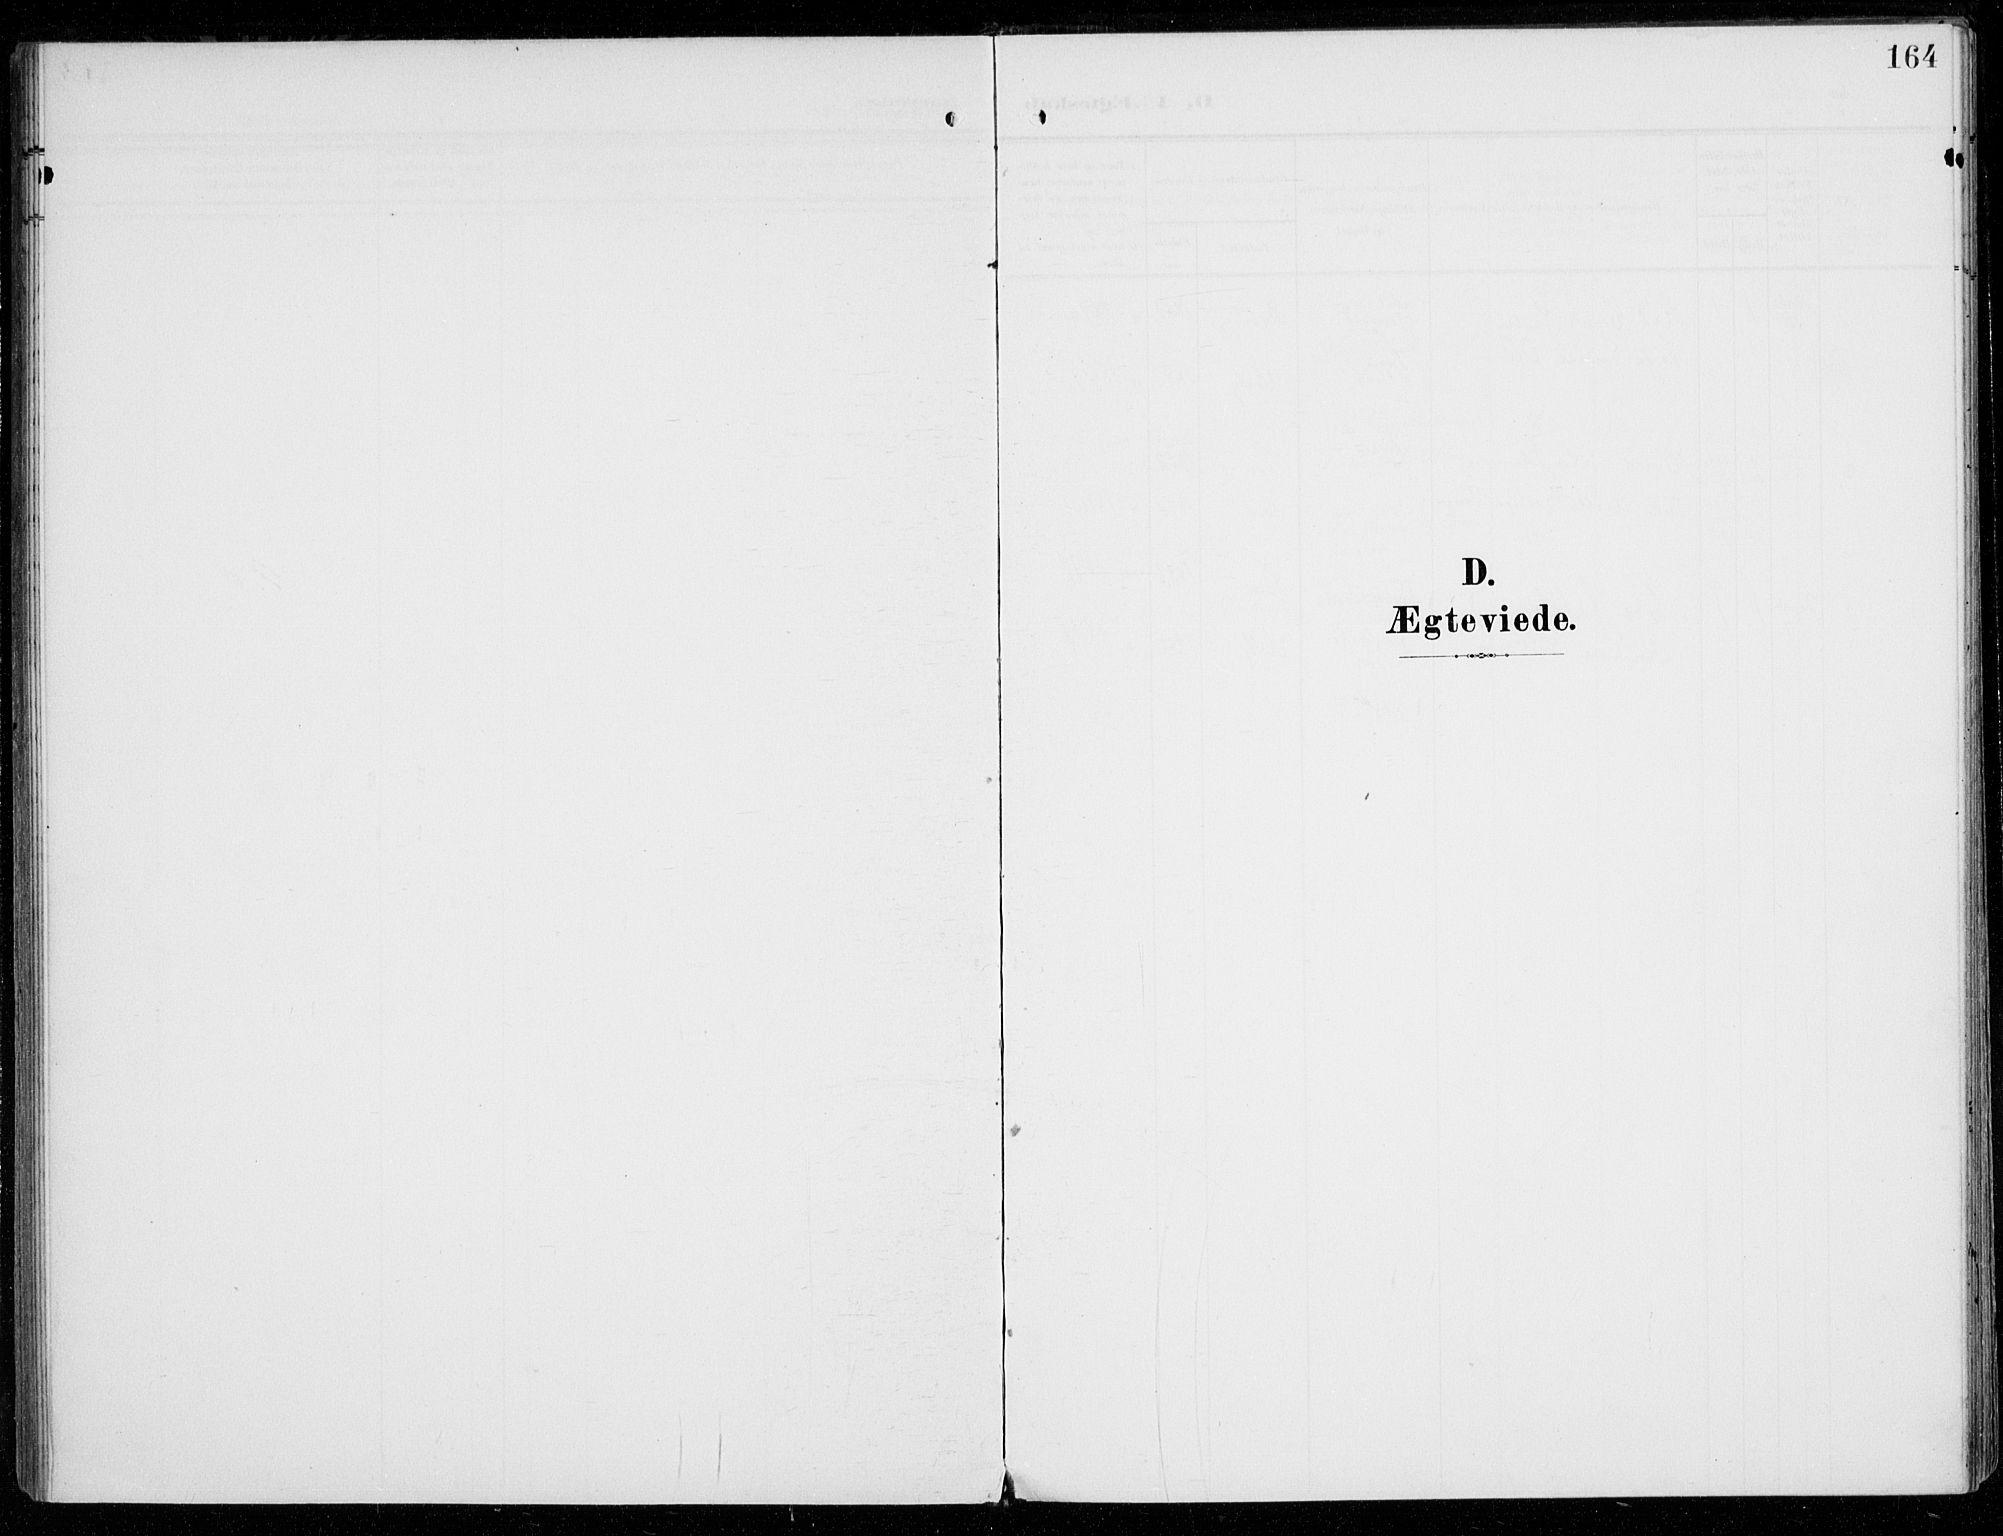 SAO, Vestby prestekontor Kirkebøker, F/Fc/L0002: Ministerialbok nr. III 2, 1906-1940, s. 164